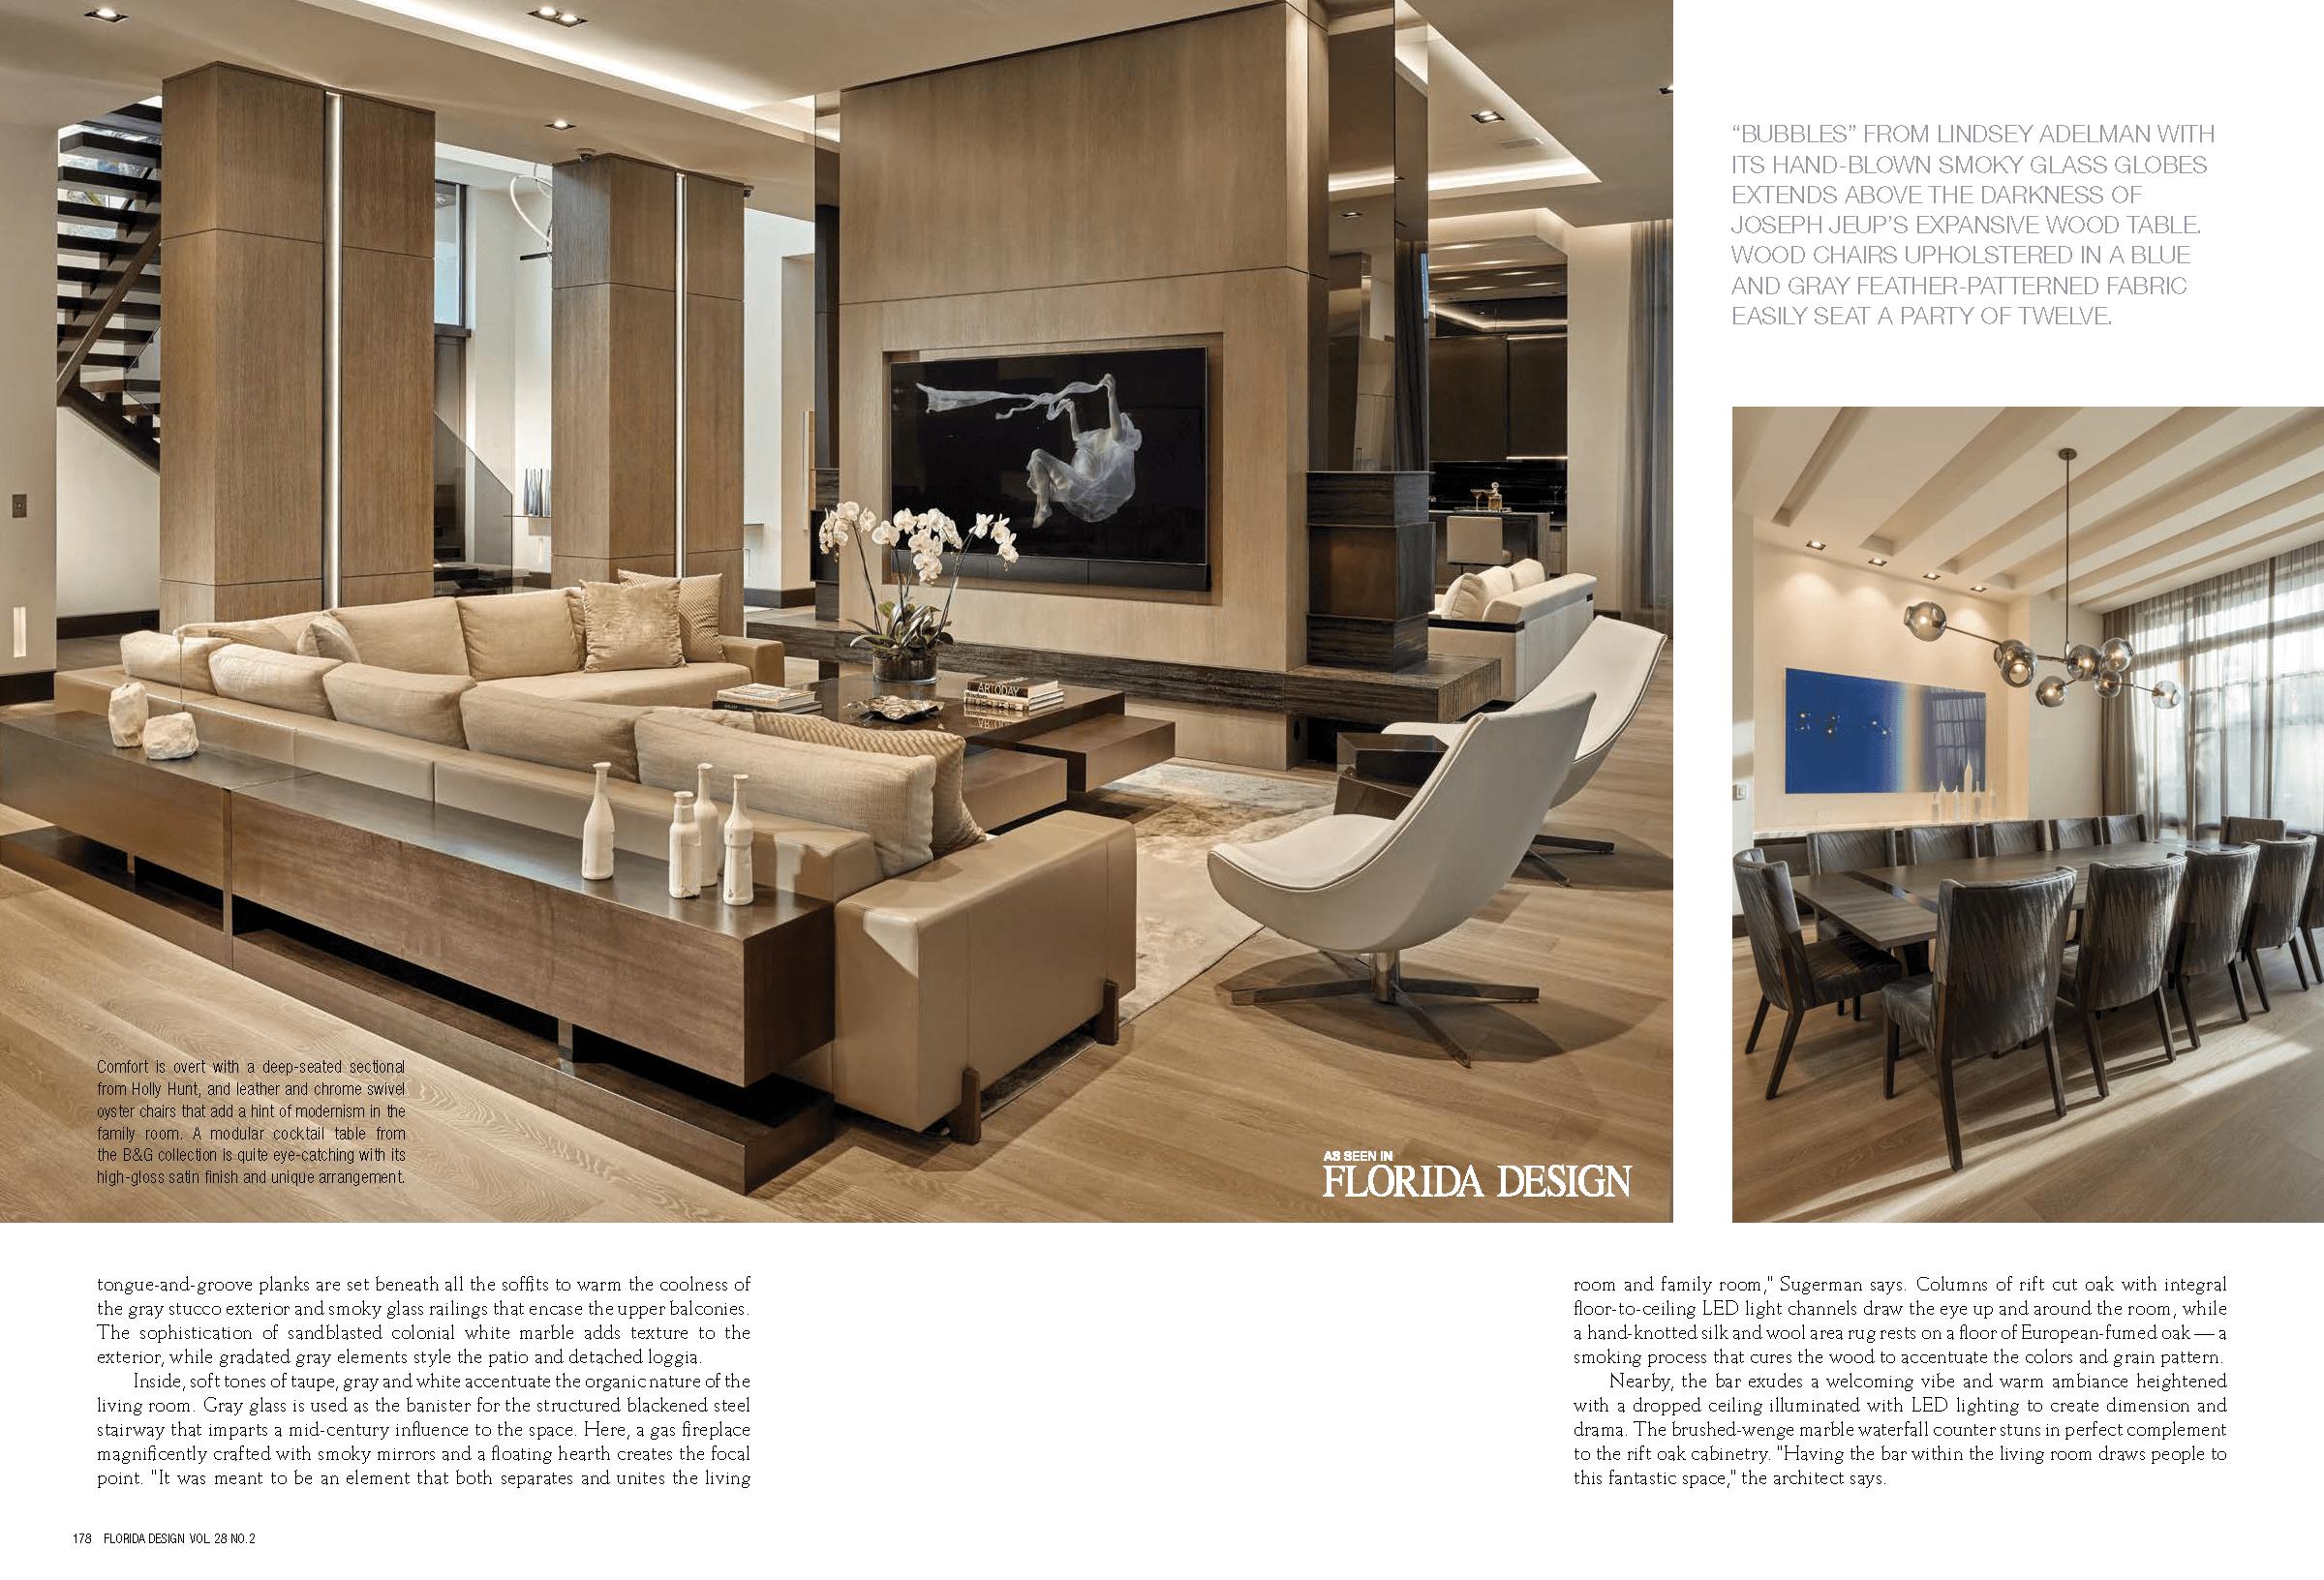 B&G Design_Berman_FD281_as seen in_Page_3.png